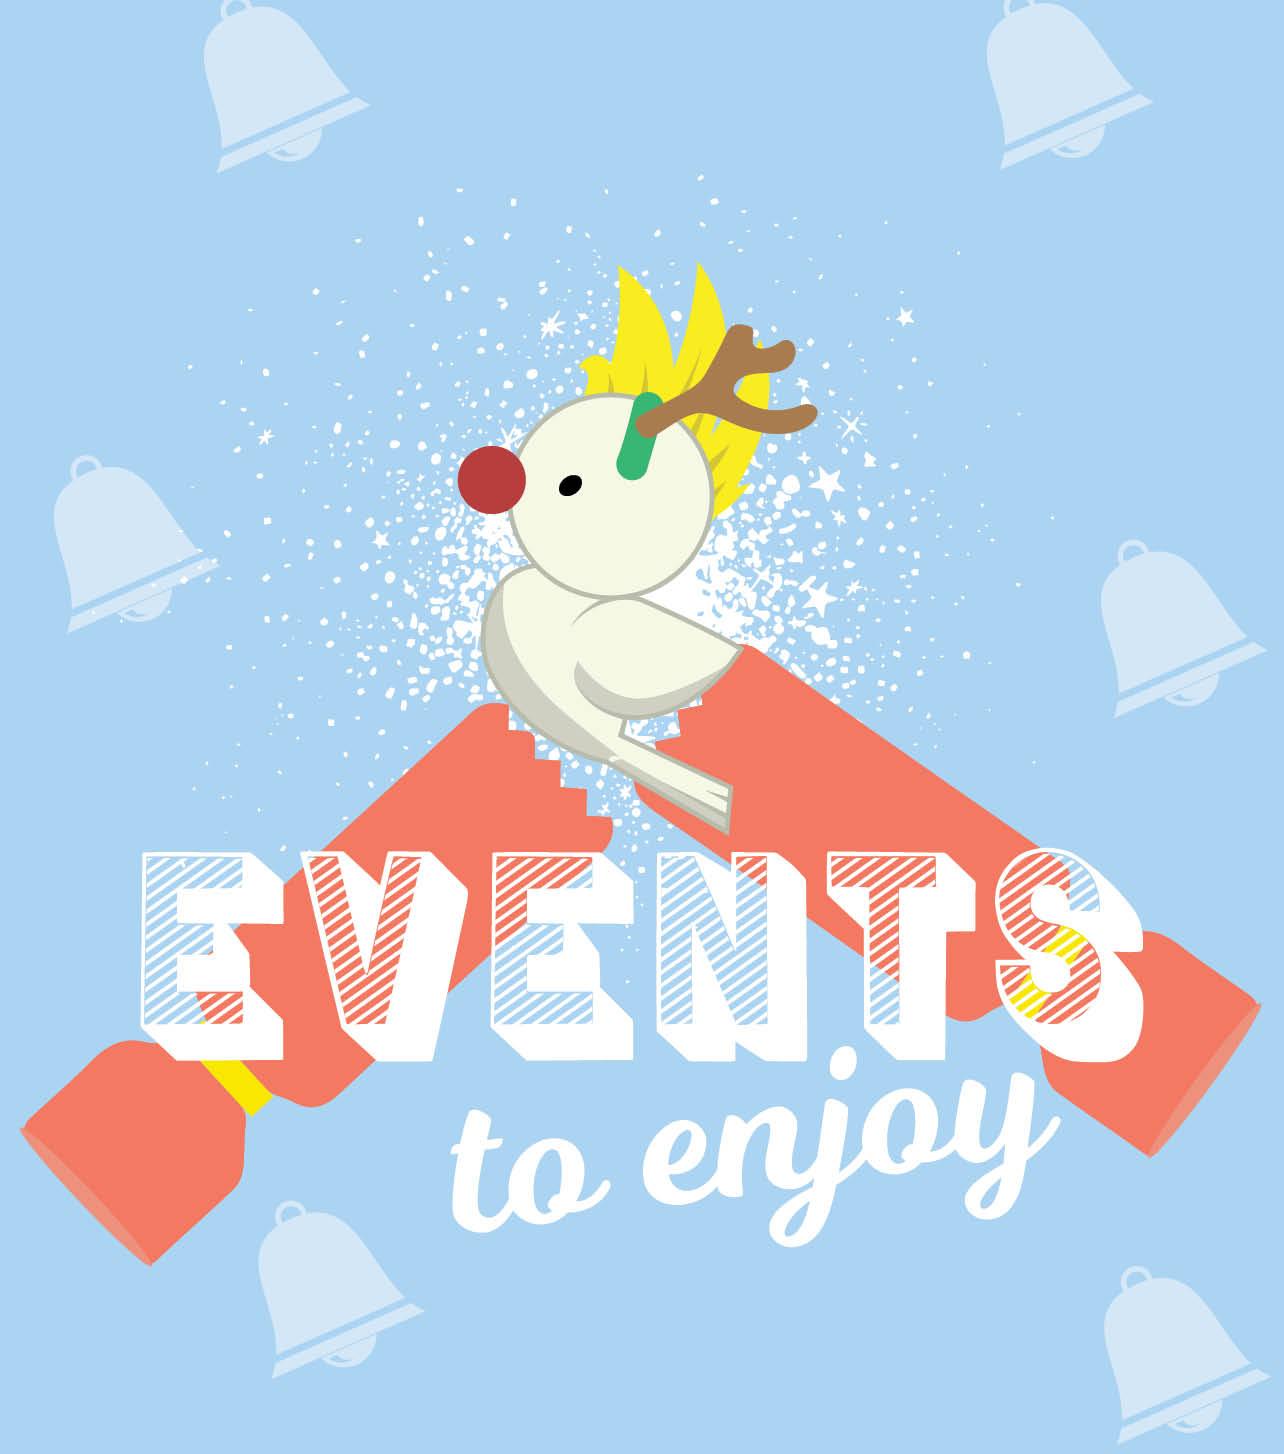 CH4806_Xmas 2019_Web Tiles_Events to enjoy_624x727px